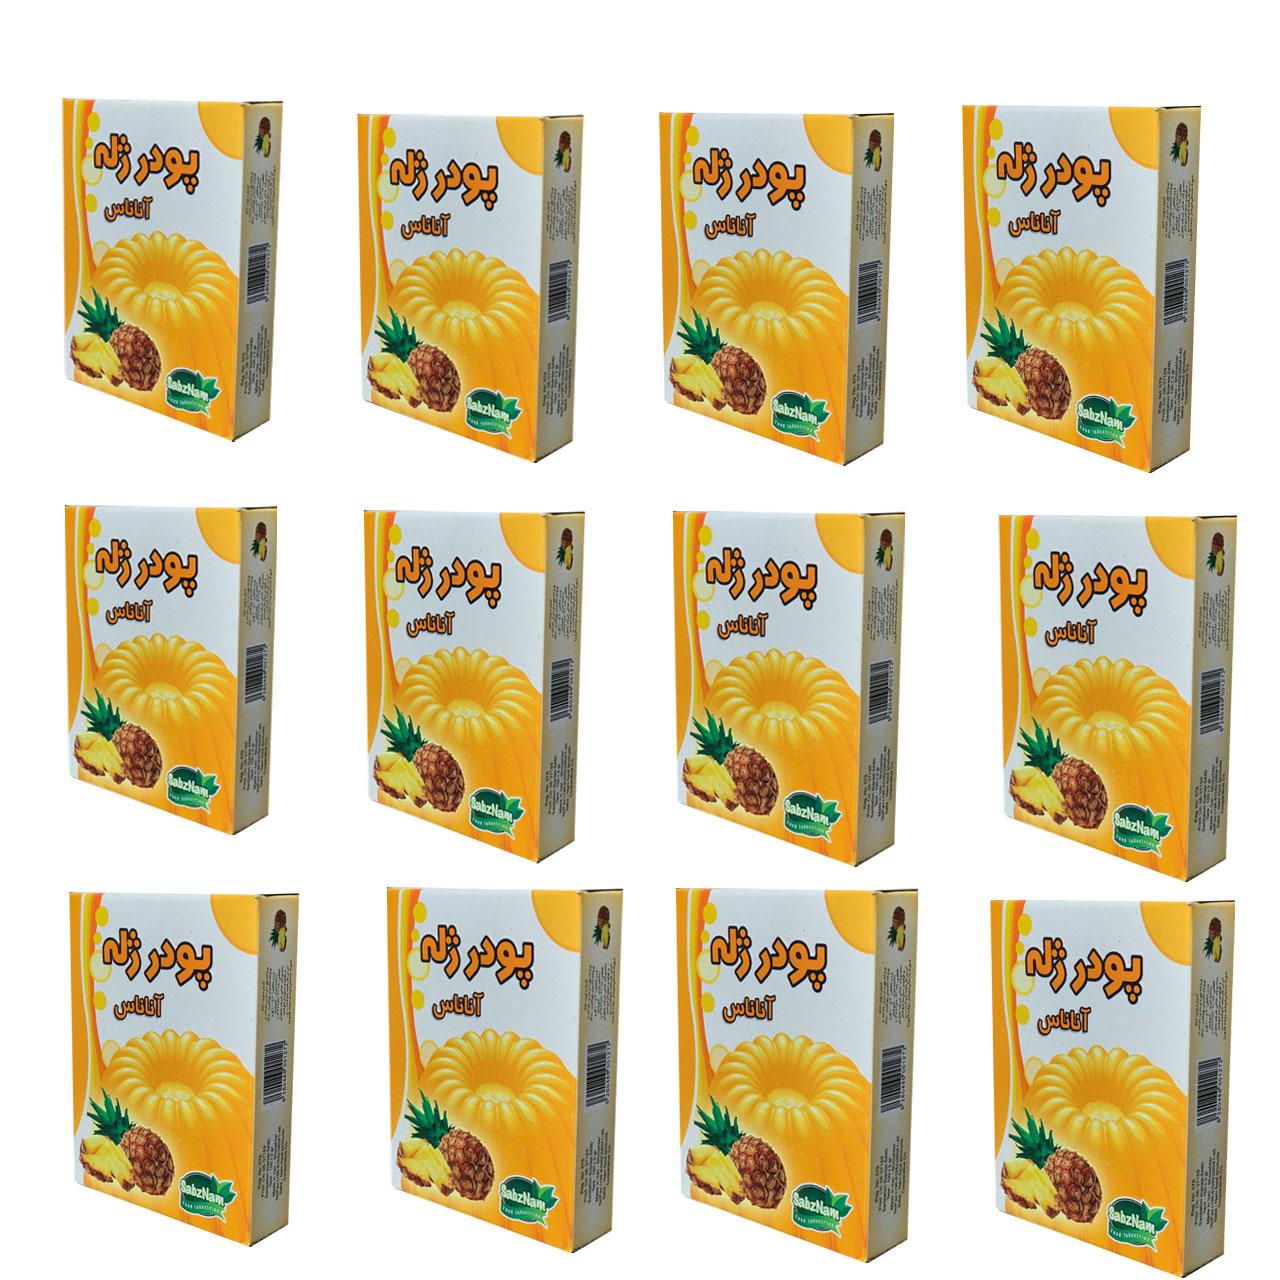 پودر ژله آناناس سبزنام-100گرم مجموعه 12 عددی